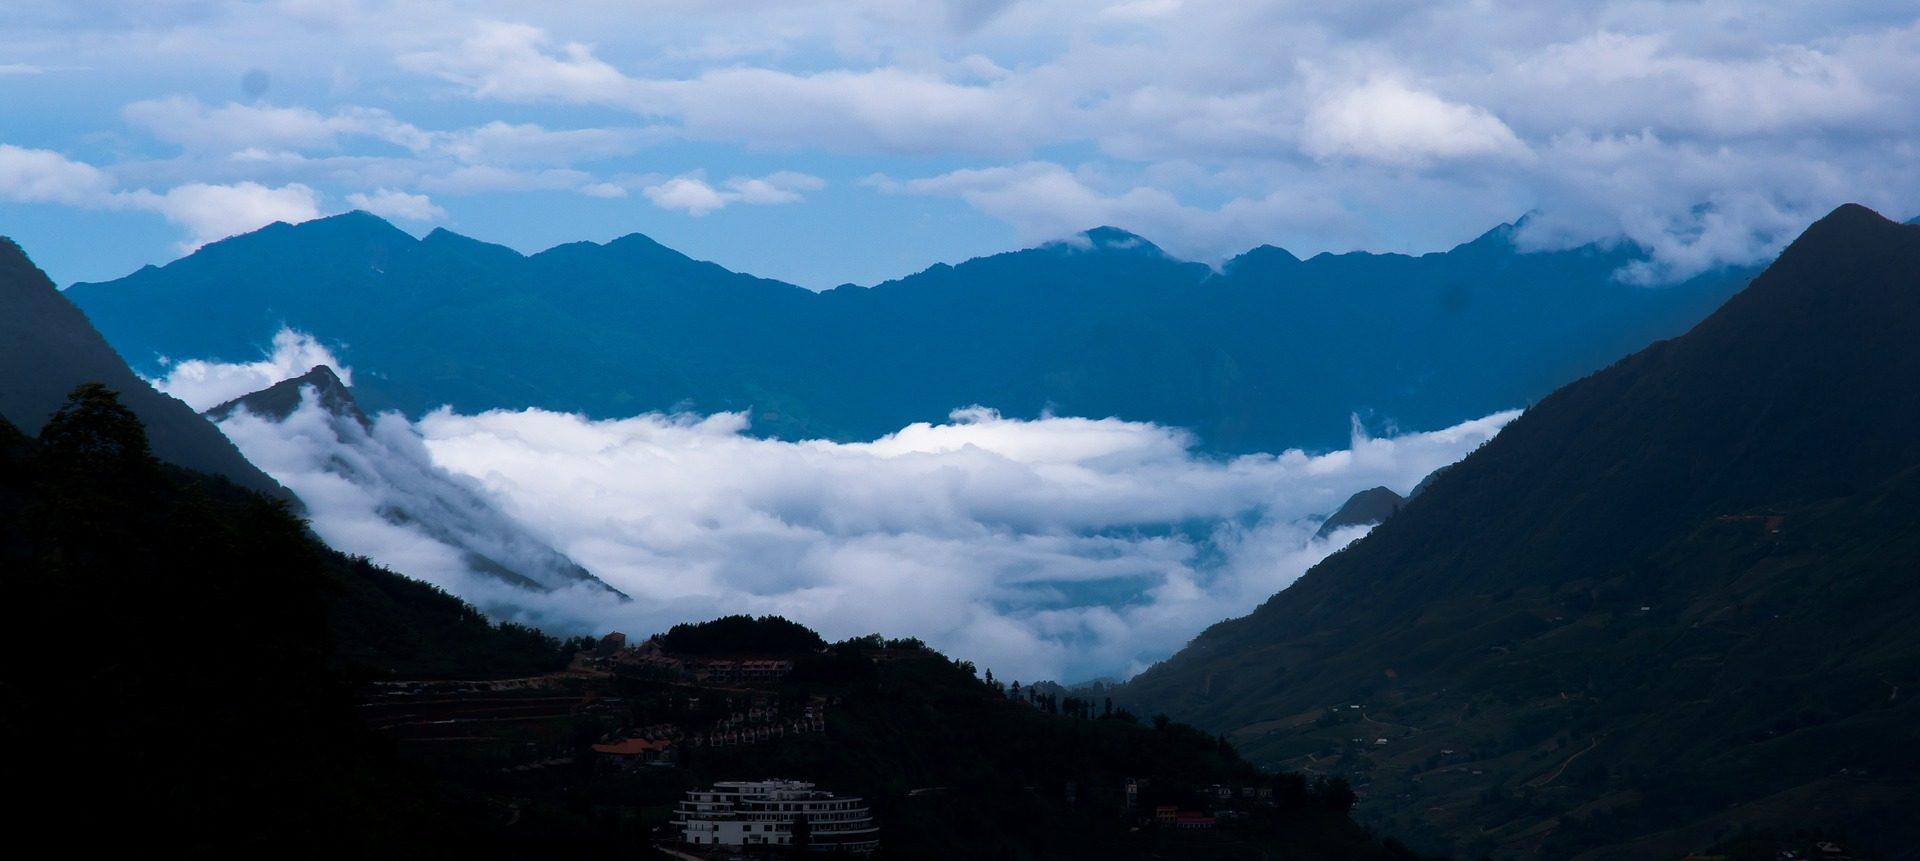 Montañas, 云彩, 山谷, 距离, 高地 - 高清壁纸 - 教授-falken.com